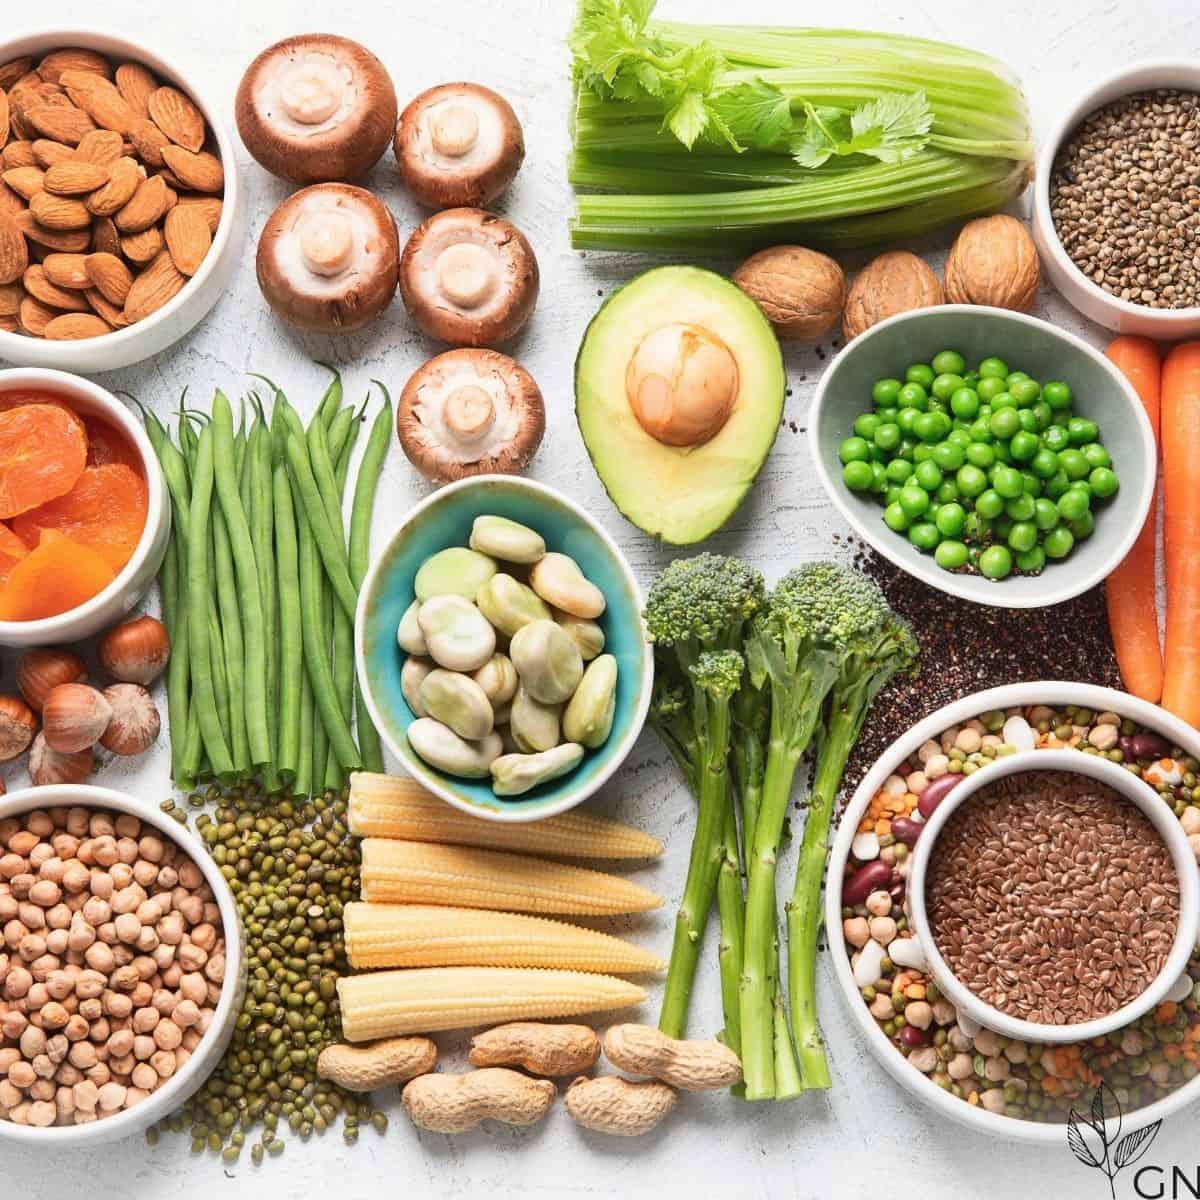 plant based foods: fruiits, vegetables, beans, seeds, nuts, mushrooms